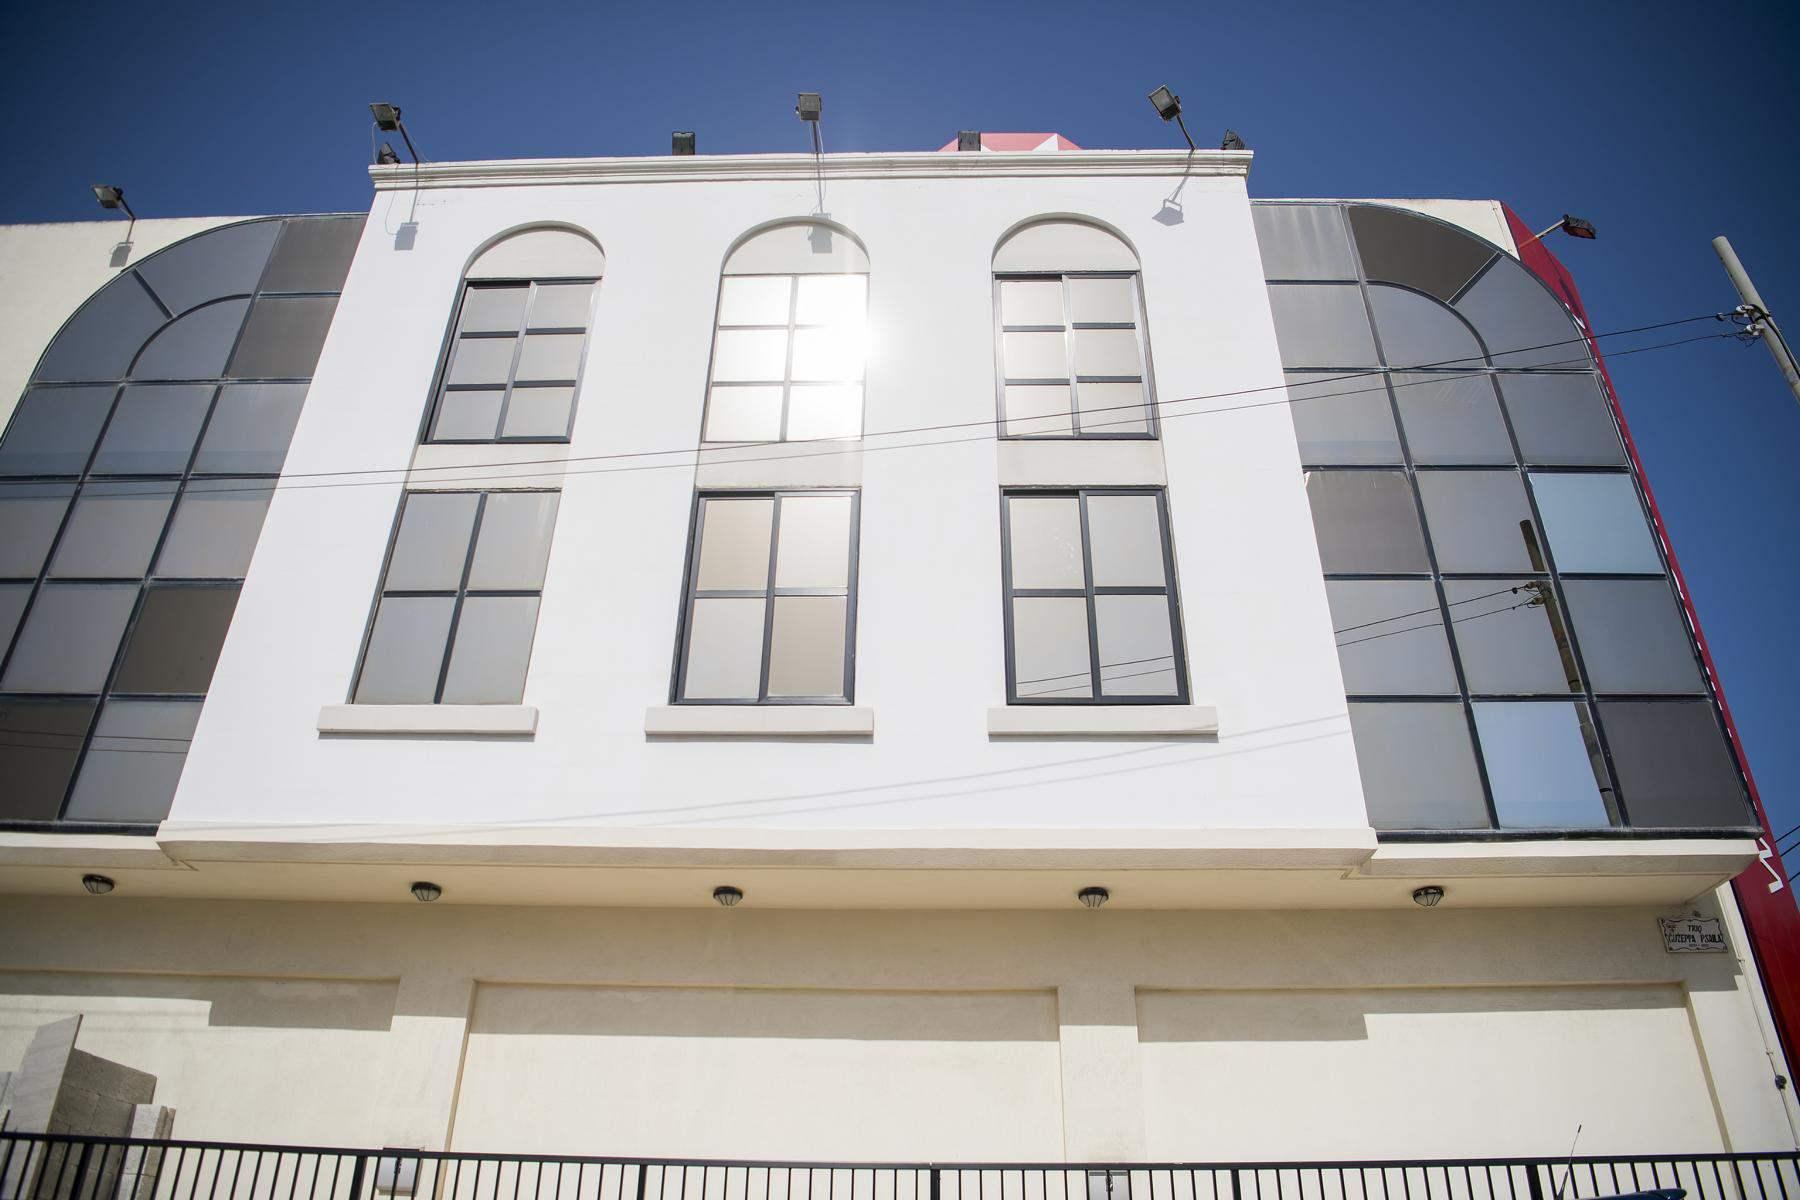 Swatar HSBC Building